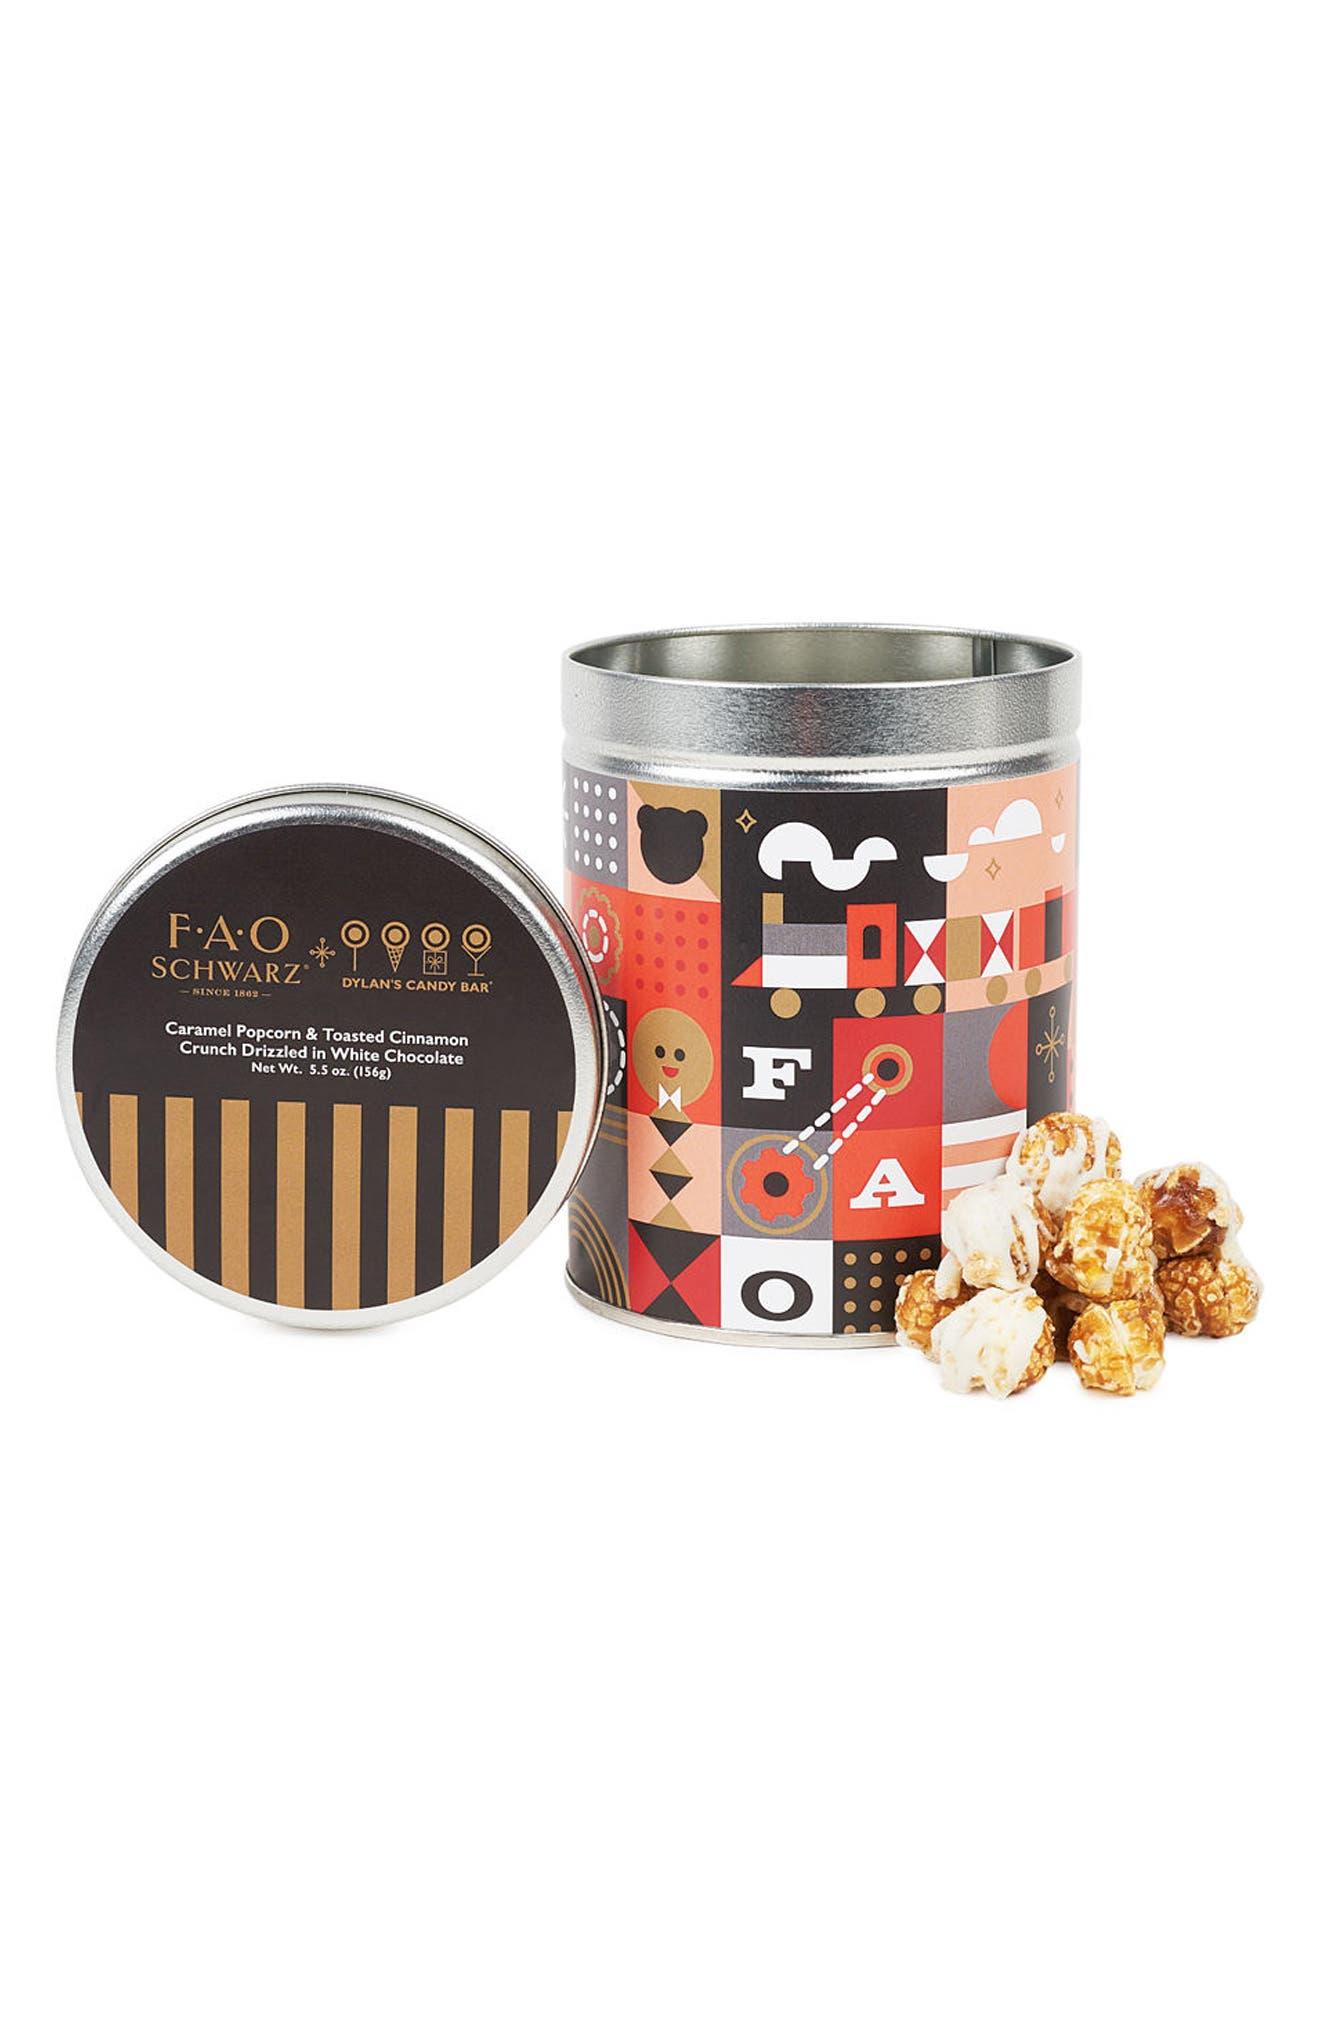 Dylan's Candy Bar x FAO Schwarz Toasted Cinnamon Popcorn Tin